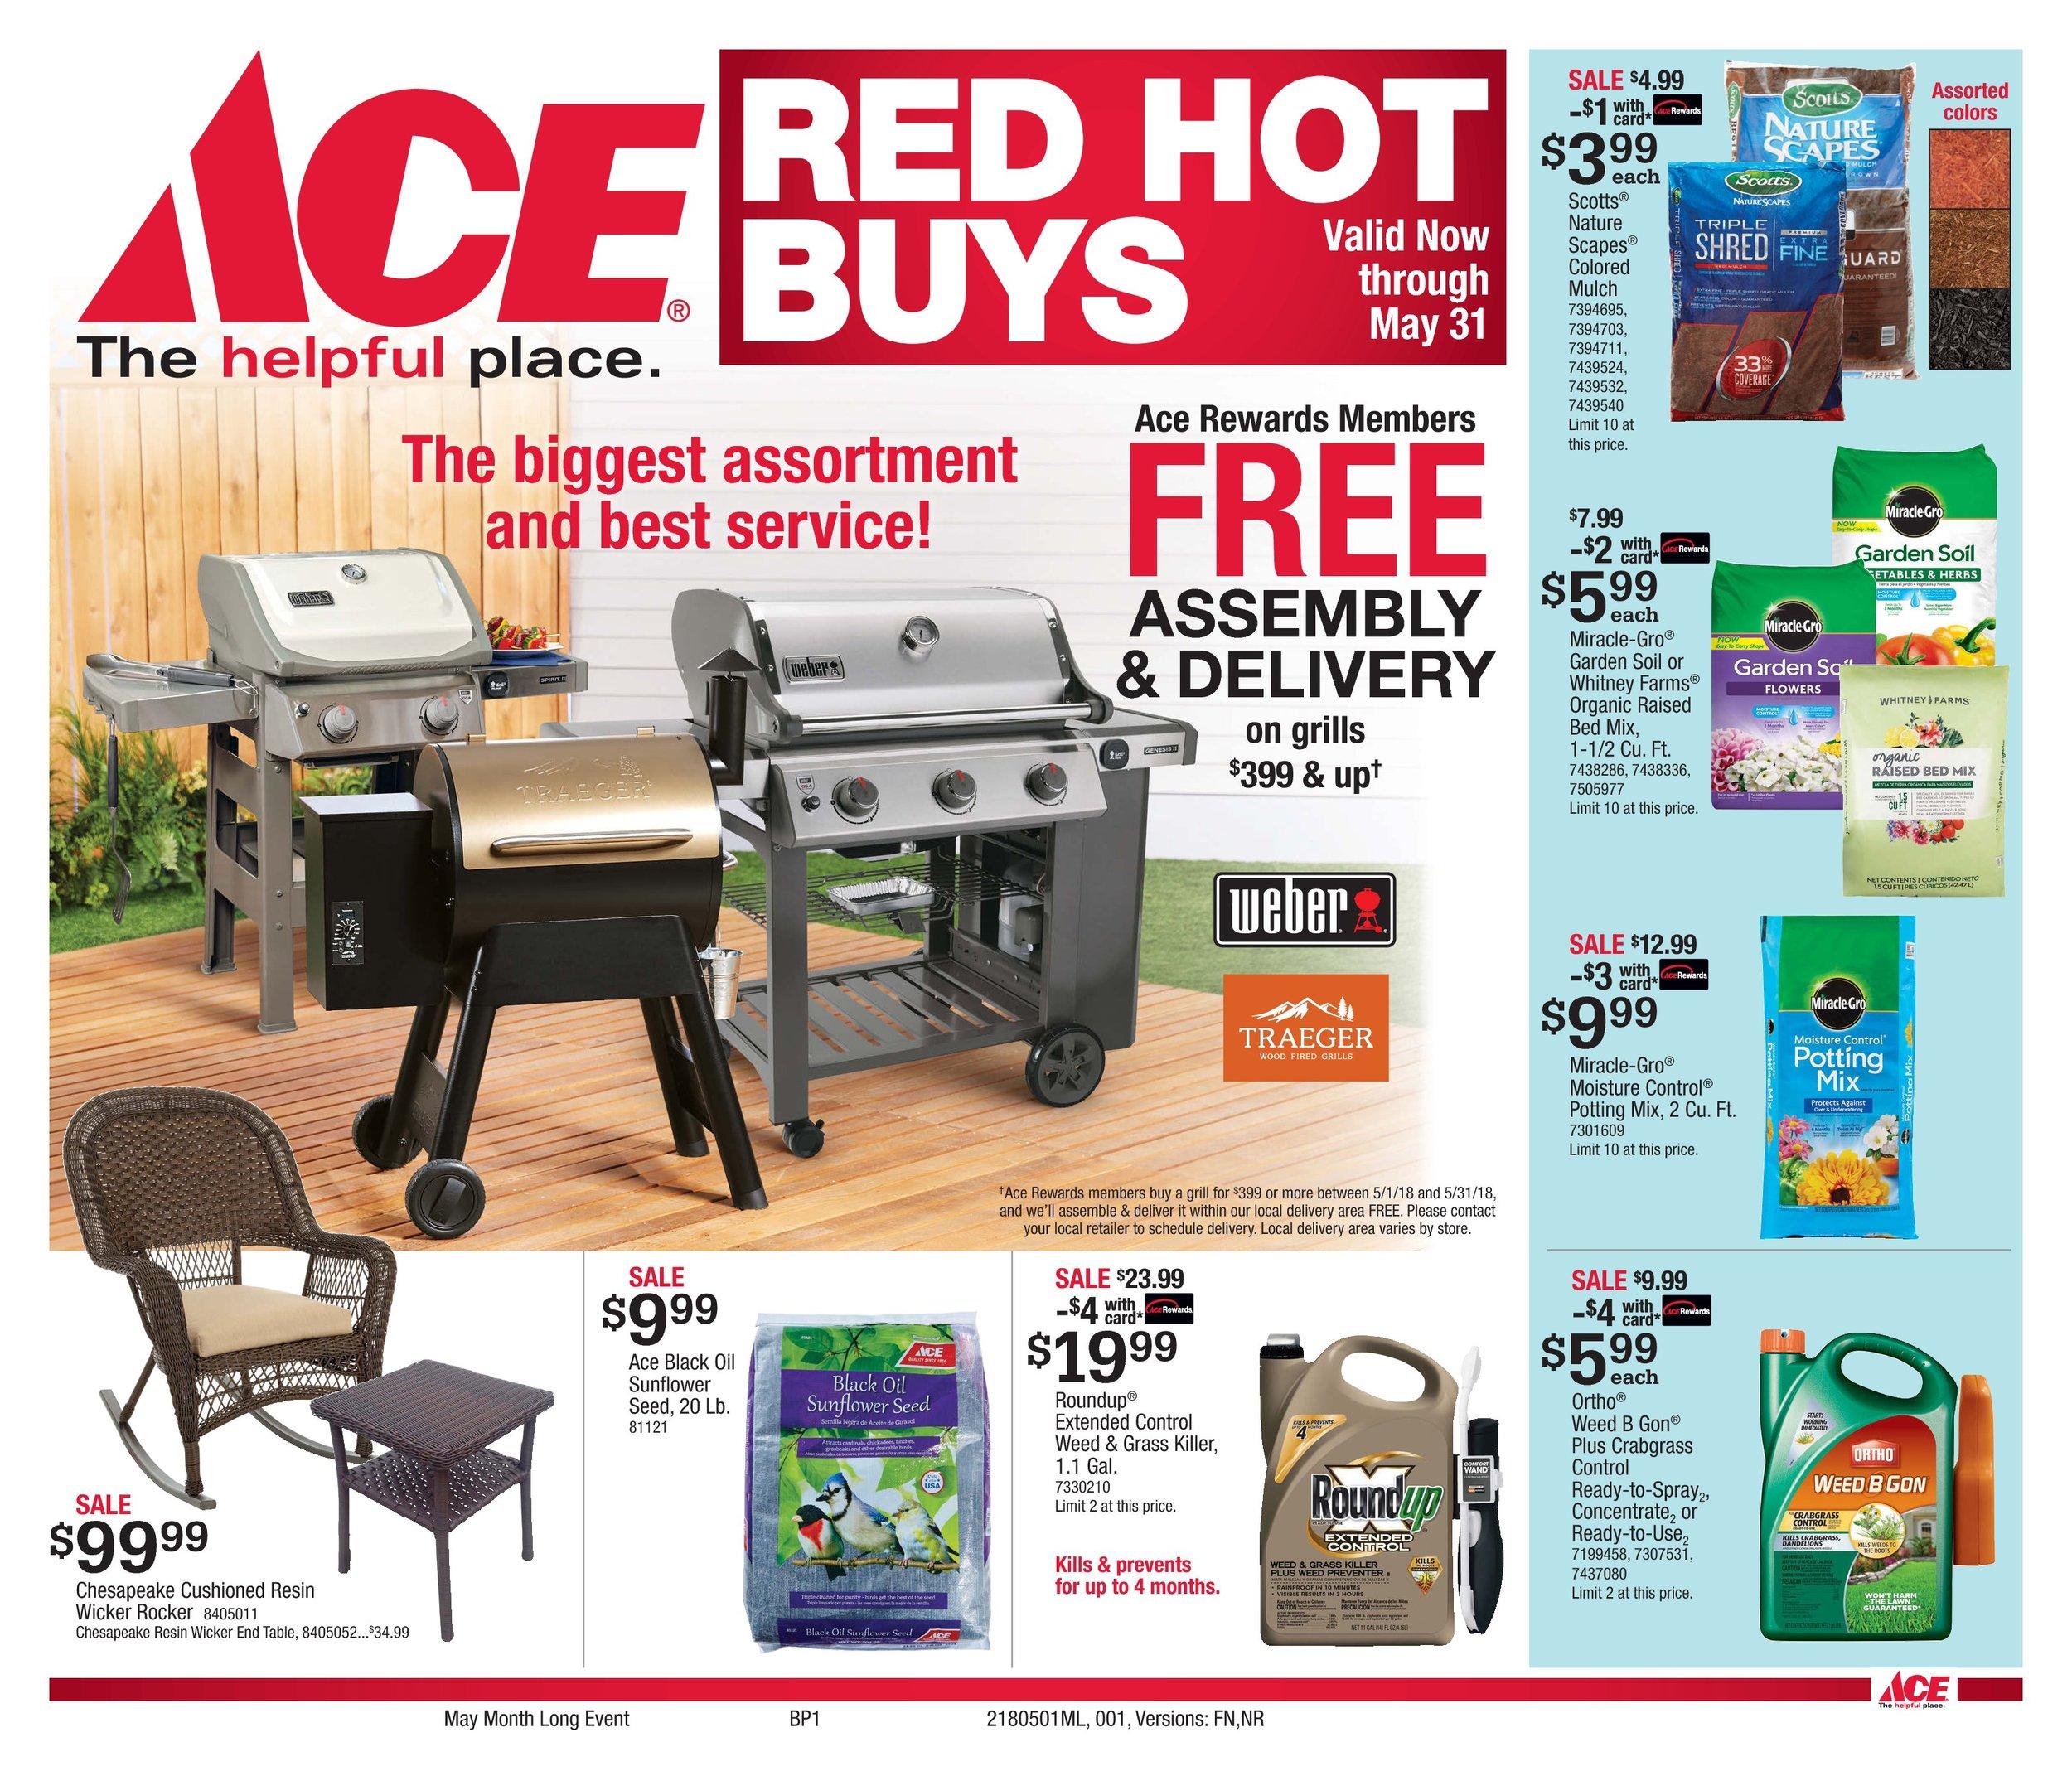 Red-Hot-Buys-FN1-p1.jpg